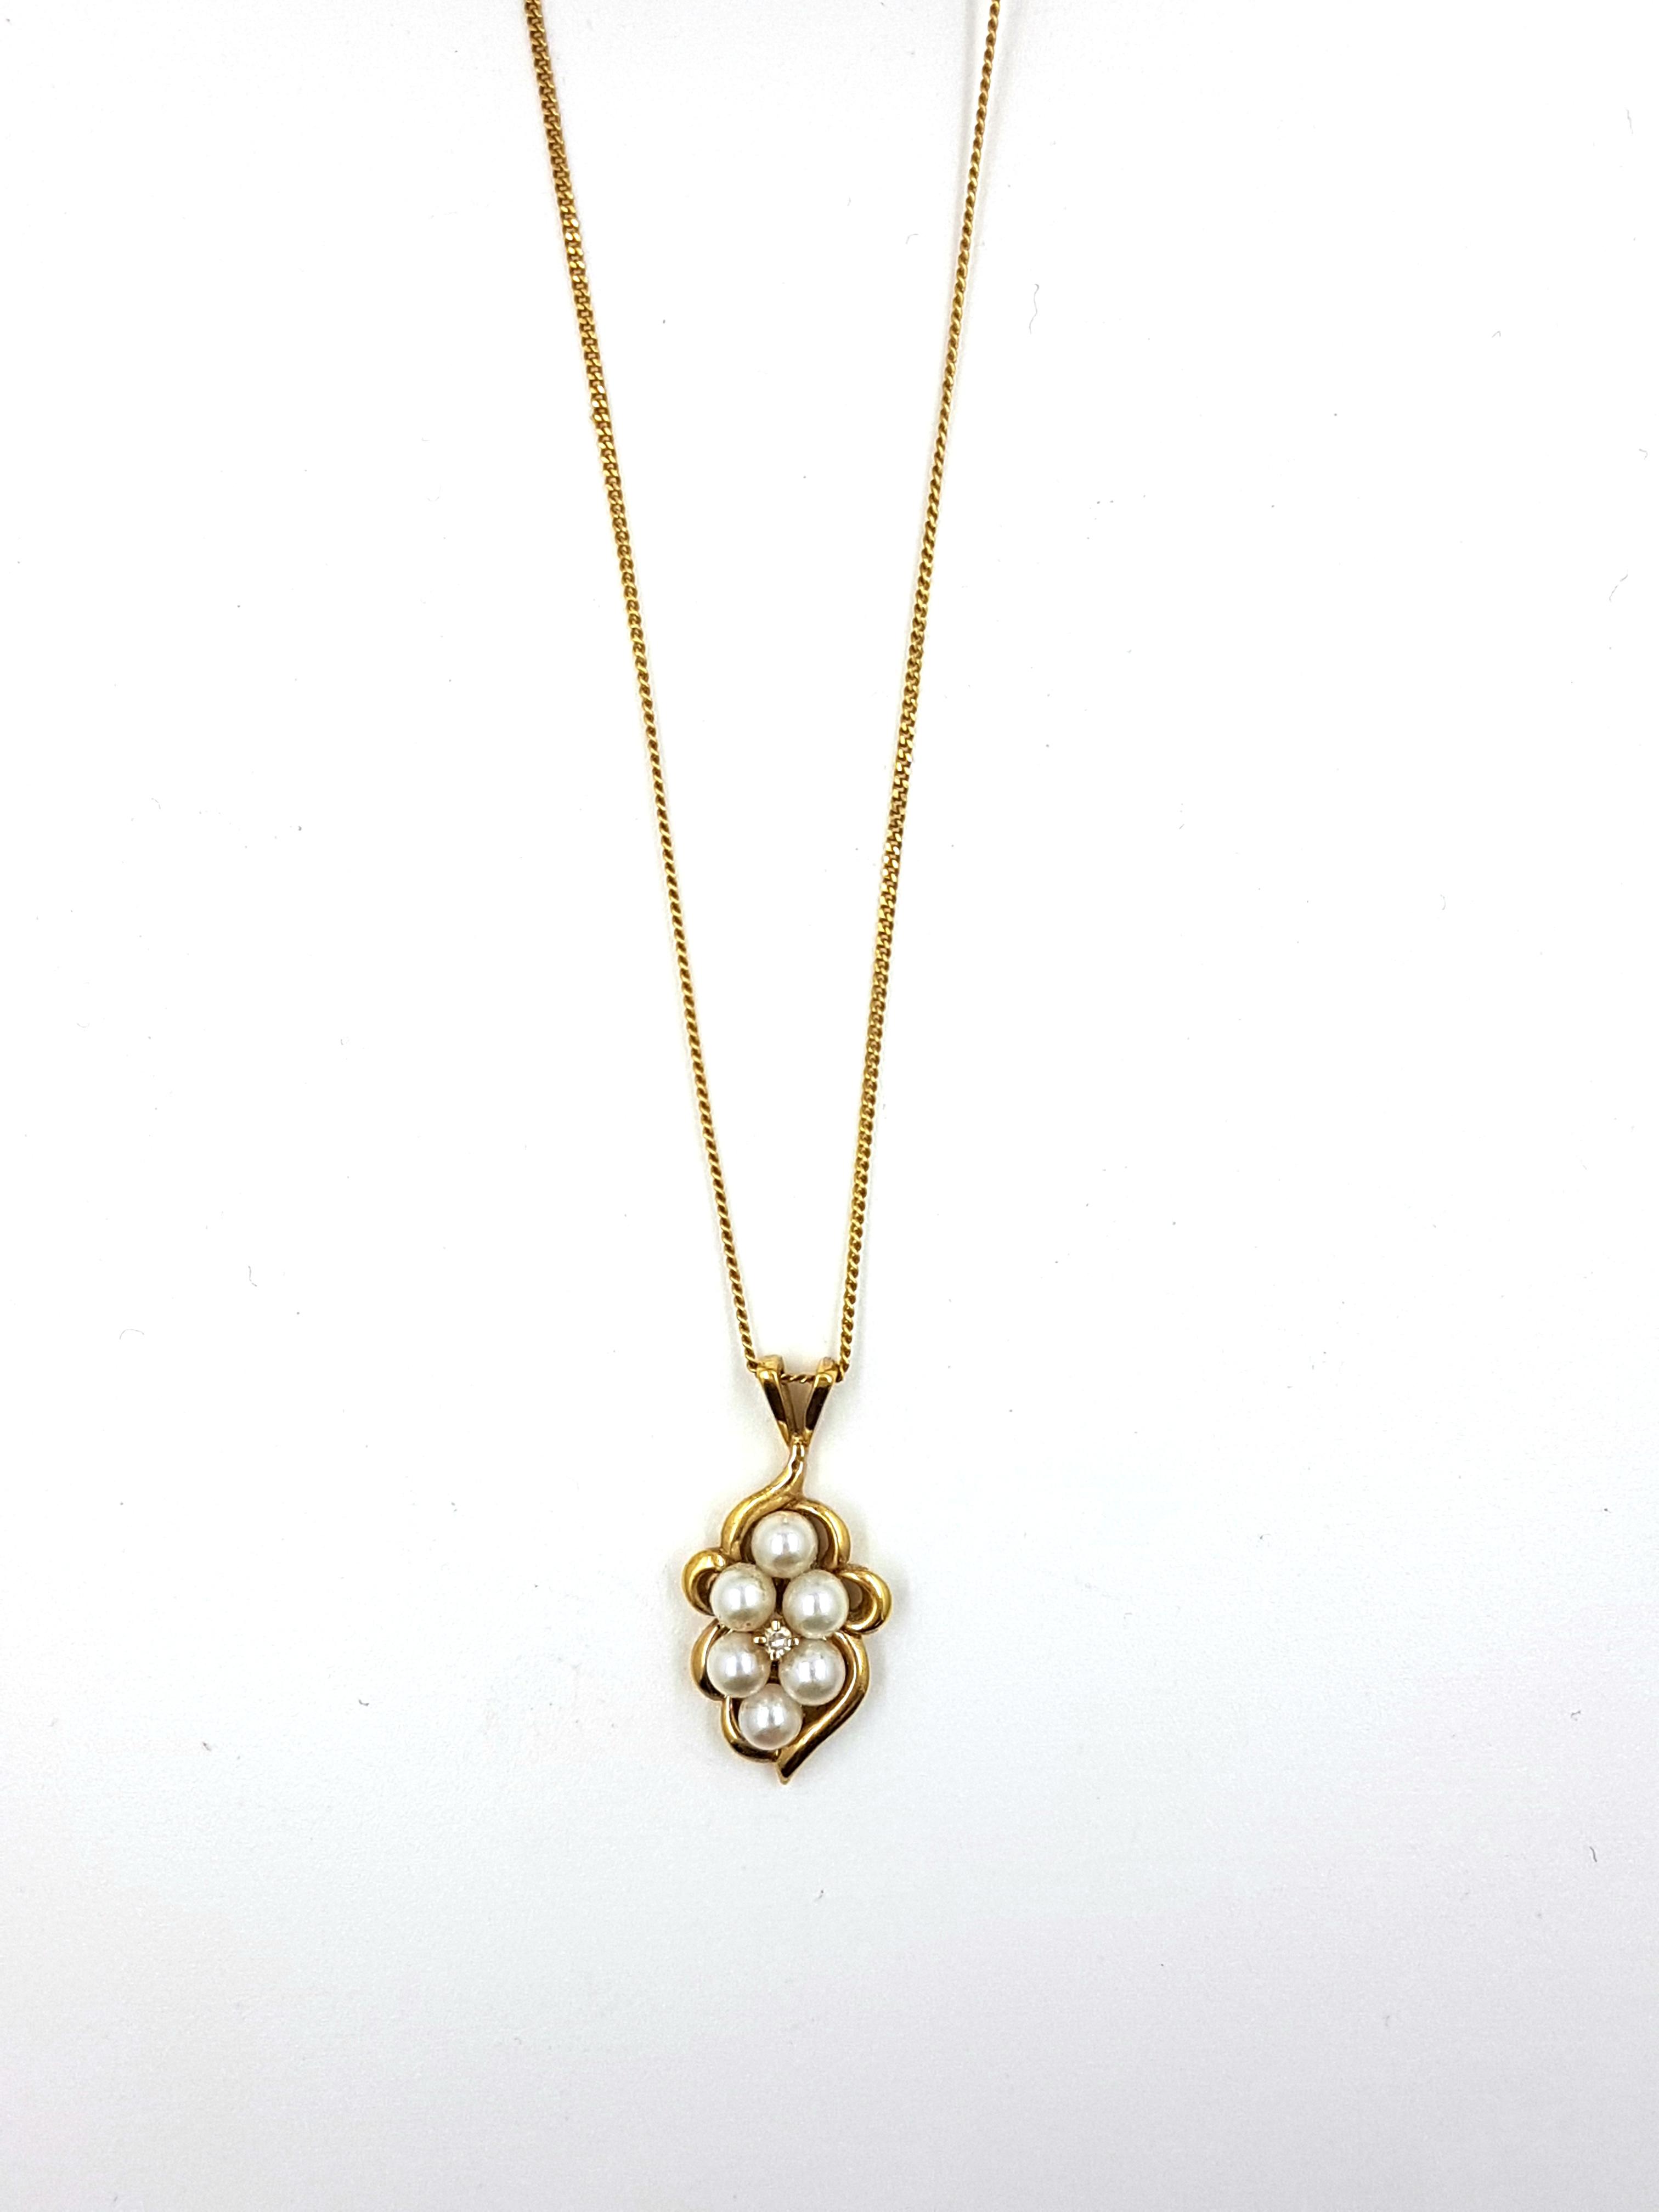 14K Yellow Gold Regular Price $850 SALE $275 Ref: NN635